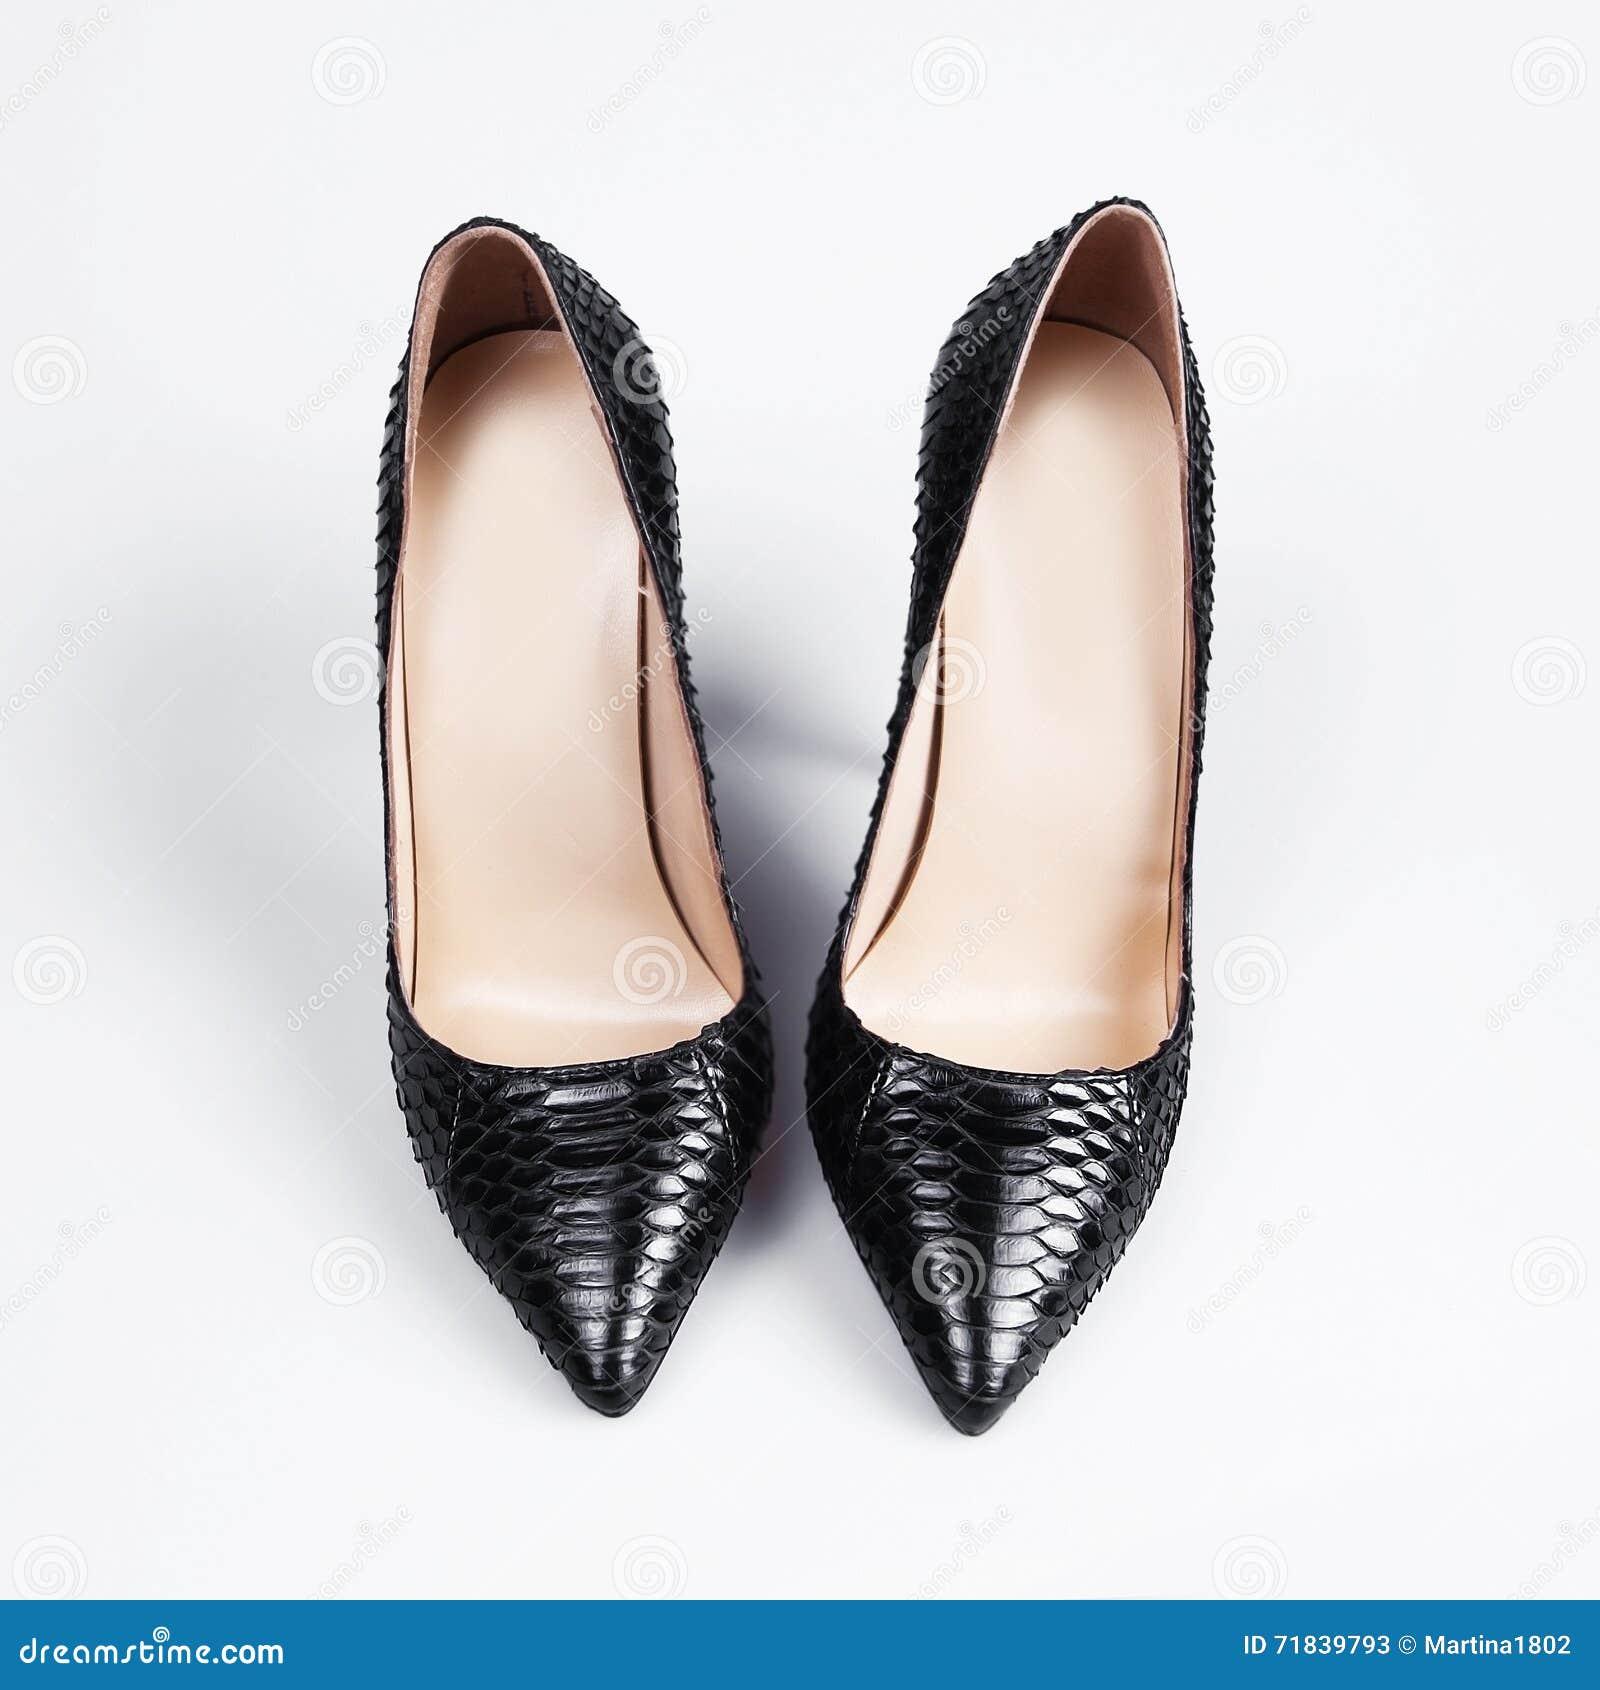 438d9449f55e Black High Heel Women Shoes On White Backgroun Stock Image - Image ...